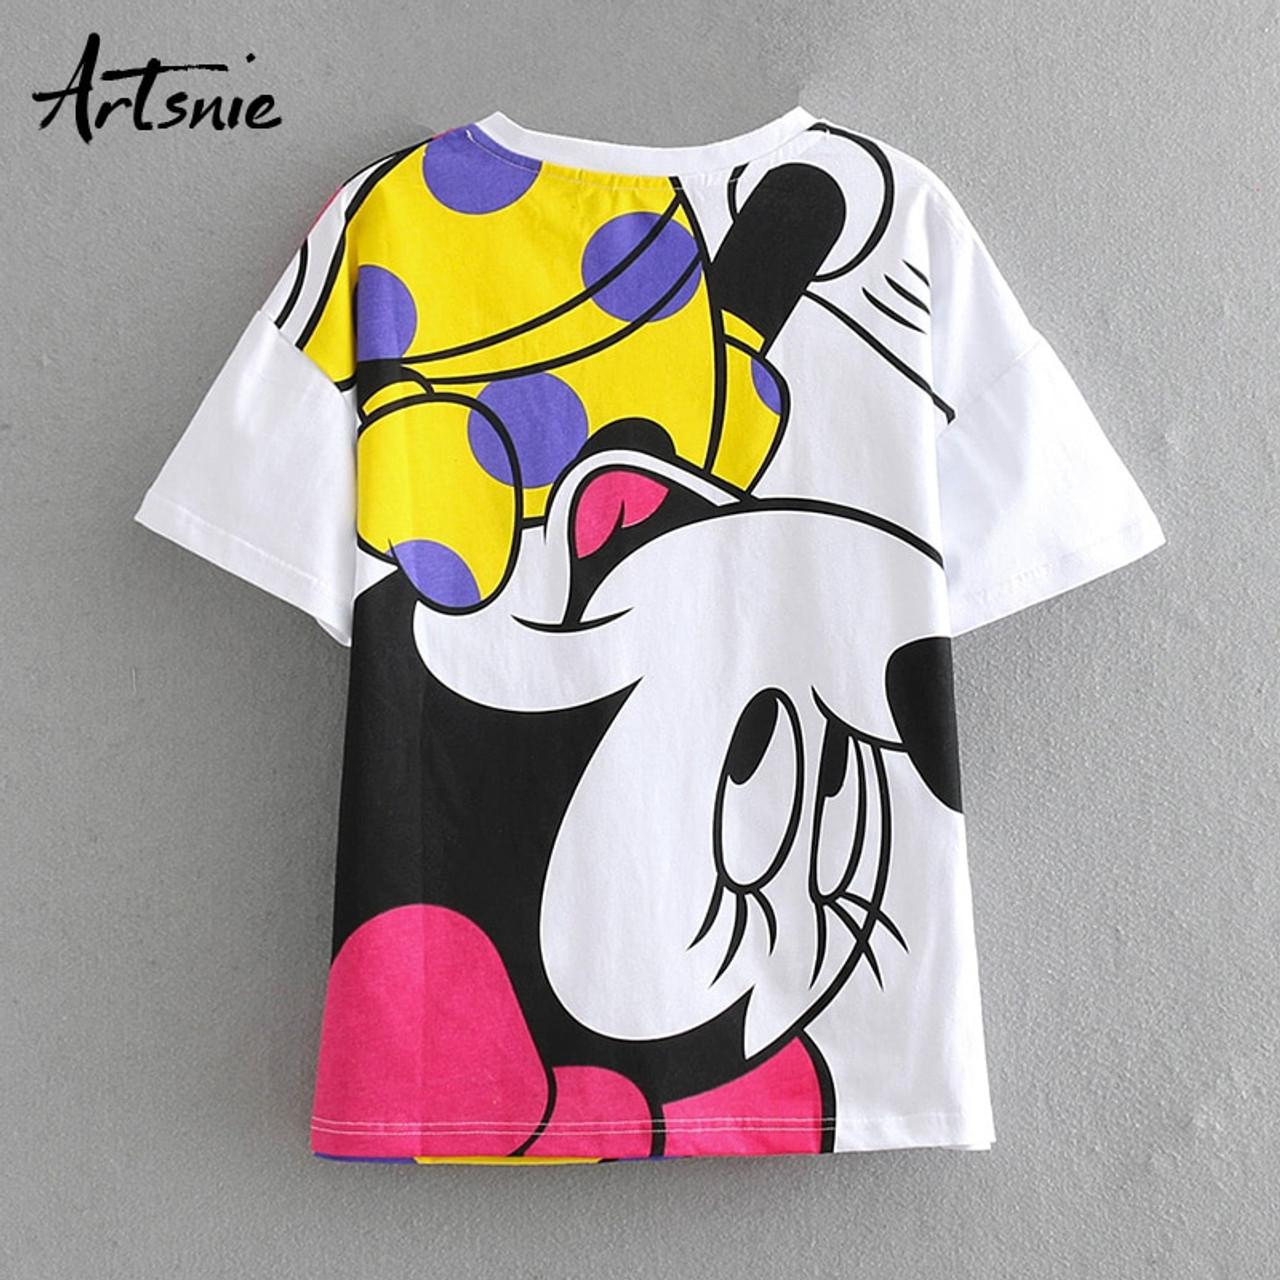 2019 Summer Fashion Cotton Pattern T-Shirt Men Cartoon with Short Sleeve Top Tees White